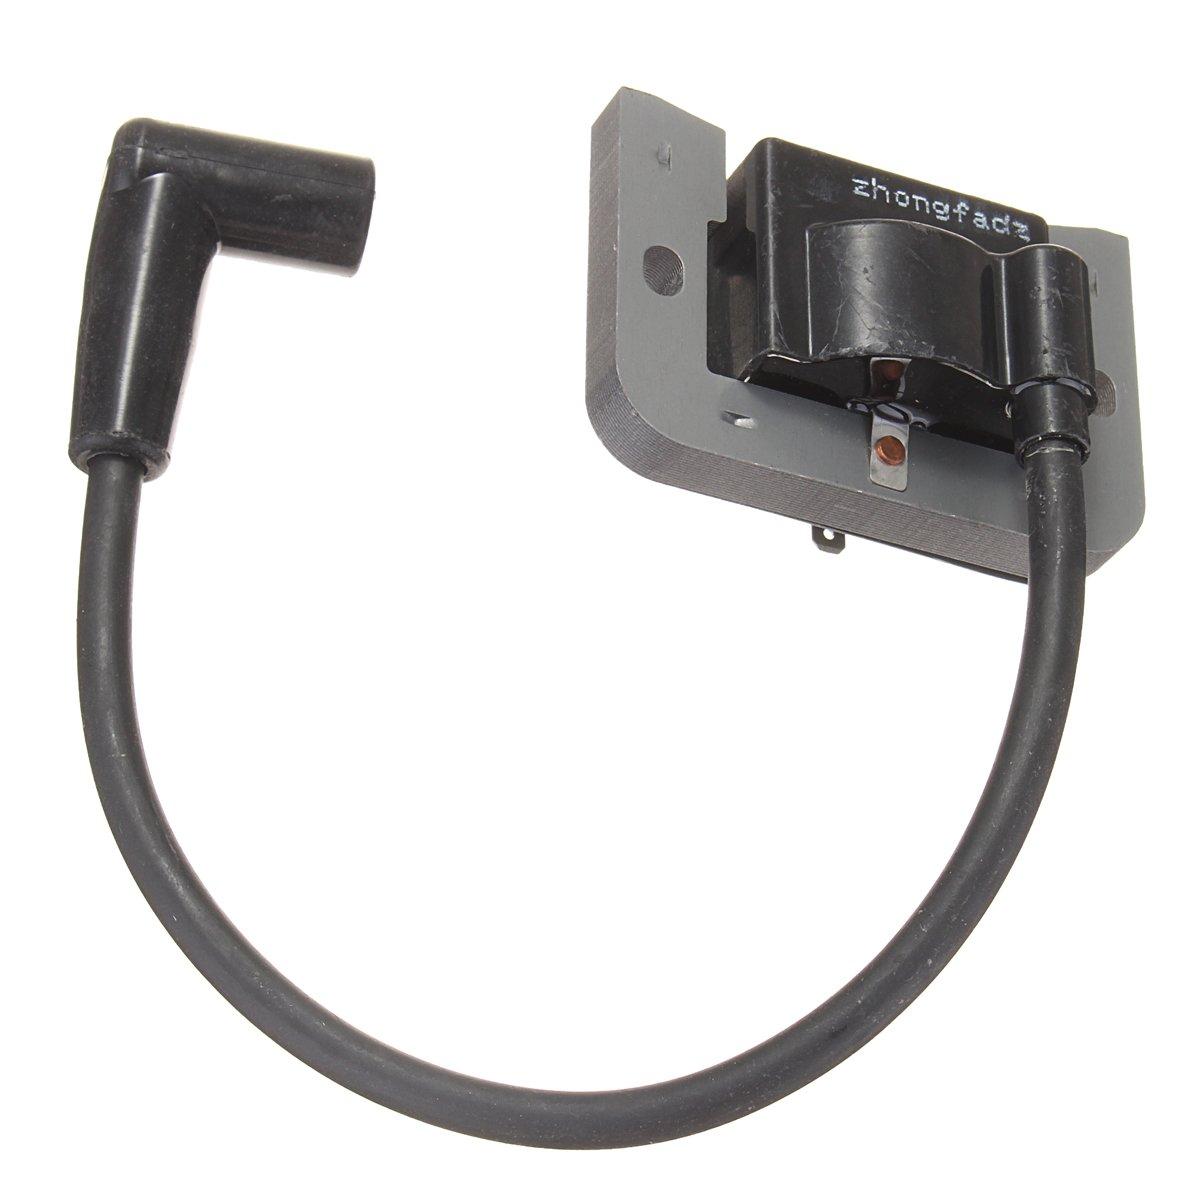 Alamor Motor Zünd Modul Spule CDI Fester Ersatzteil Für Kohler 20 584 03S:  Amazon.de: Küche U0026 Haushalt